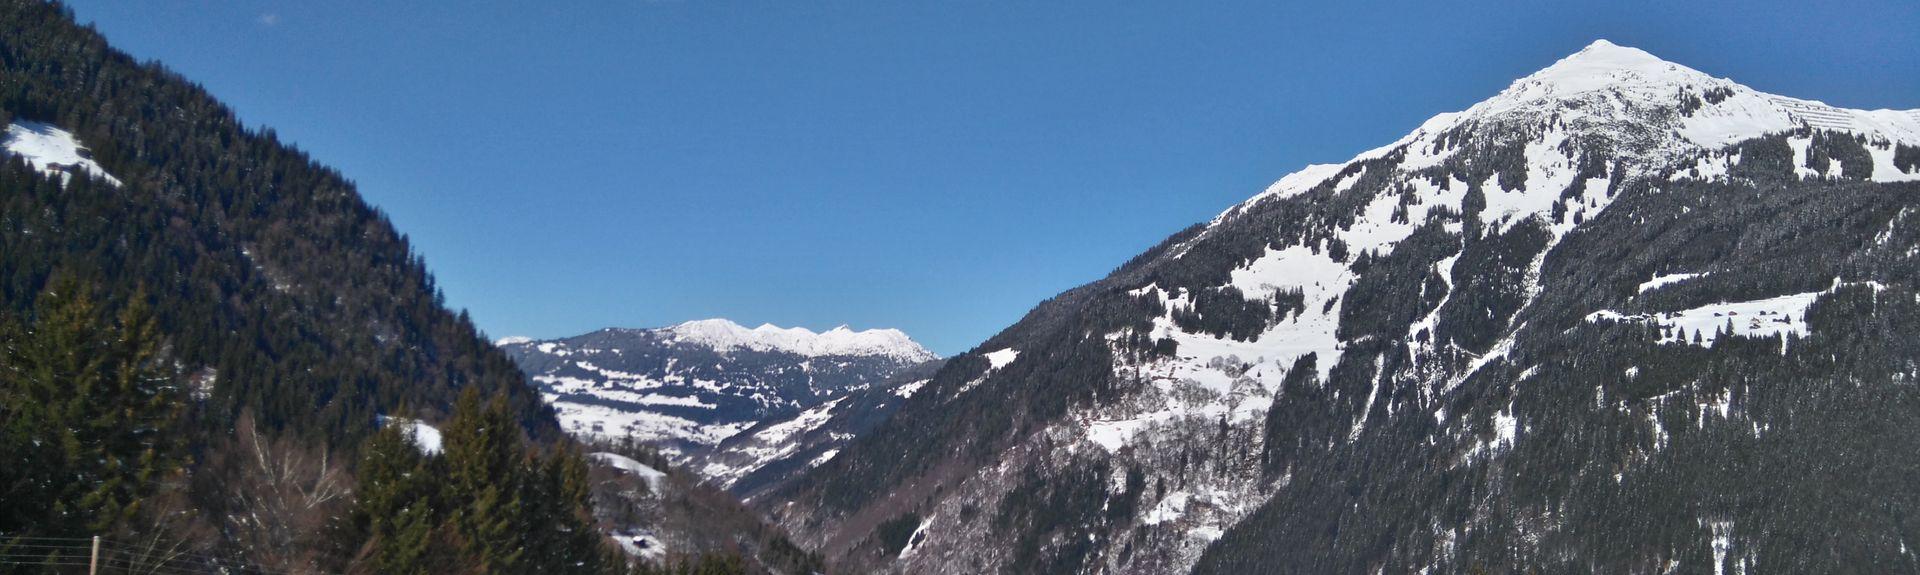 Tschagguns, Vorarlberg, Oostenrijk